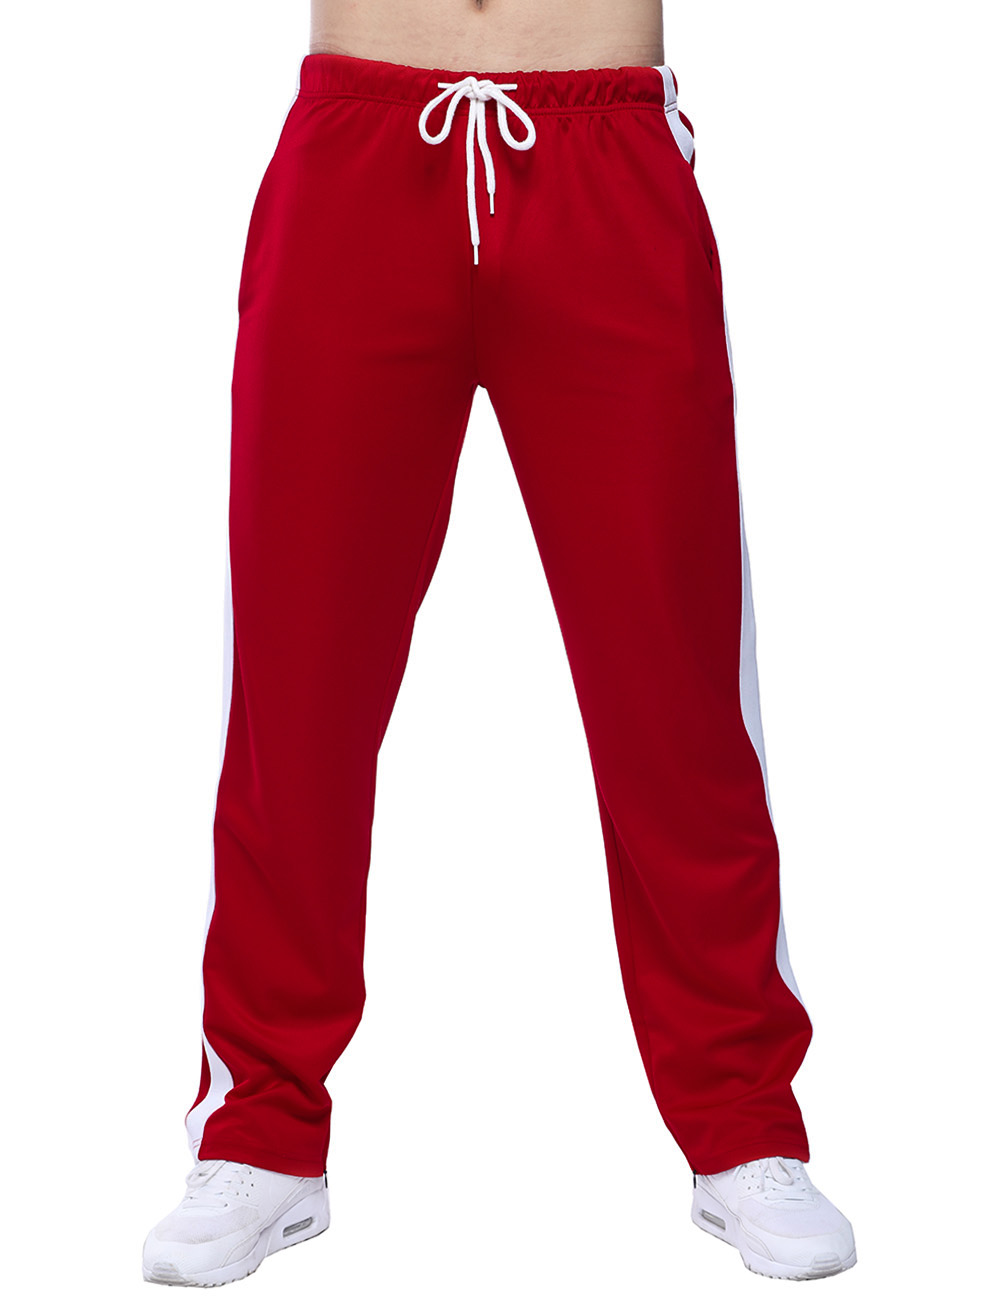 Brand Men Pants casual Harem Pants 2017 Male Trousers Mens loose striped Pants Sweatpants Large size 2XL